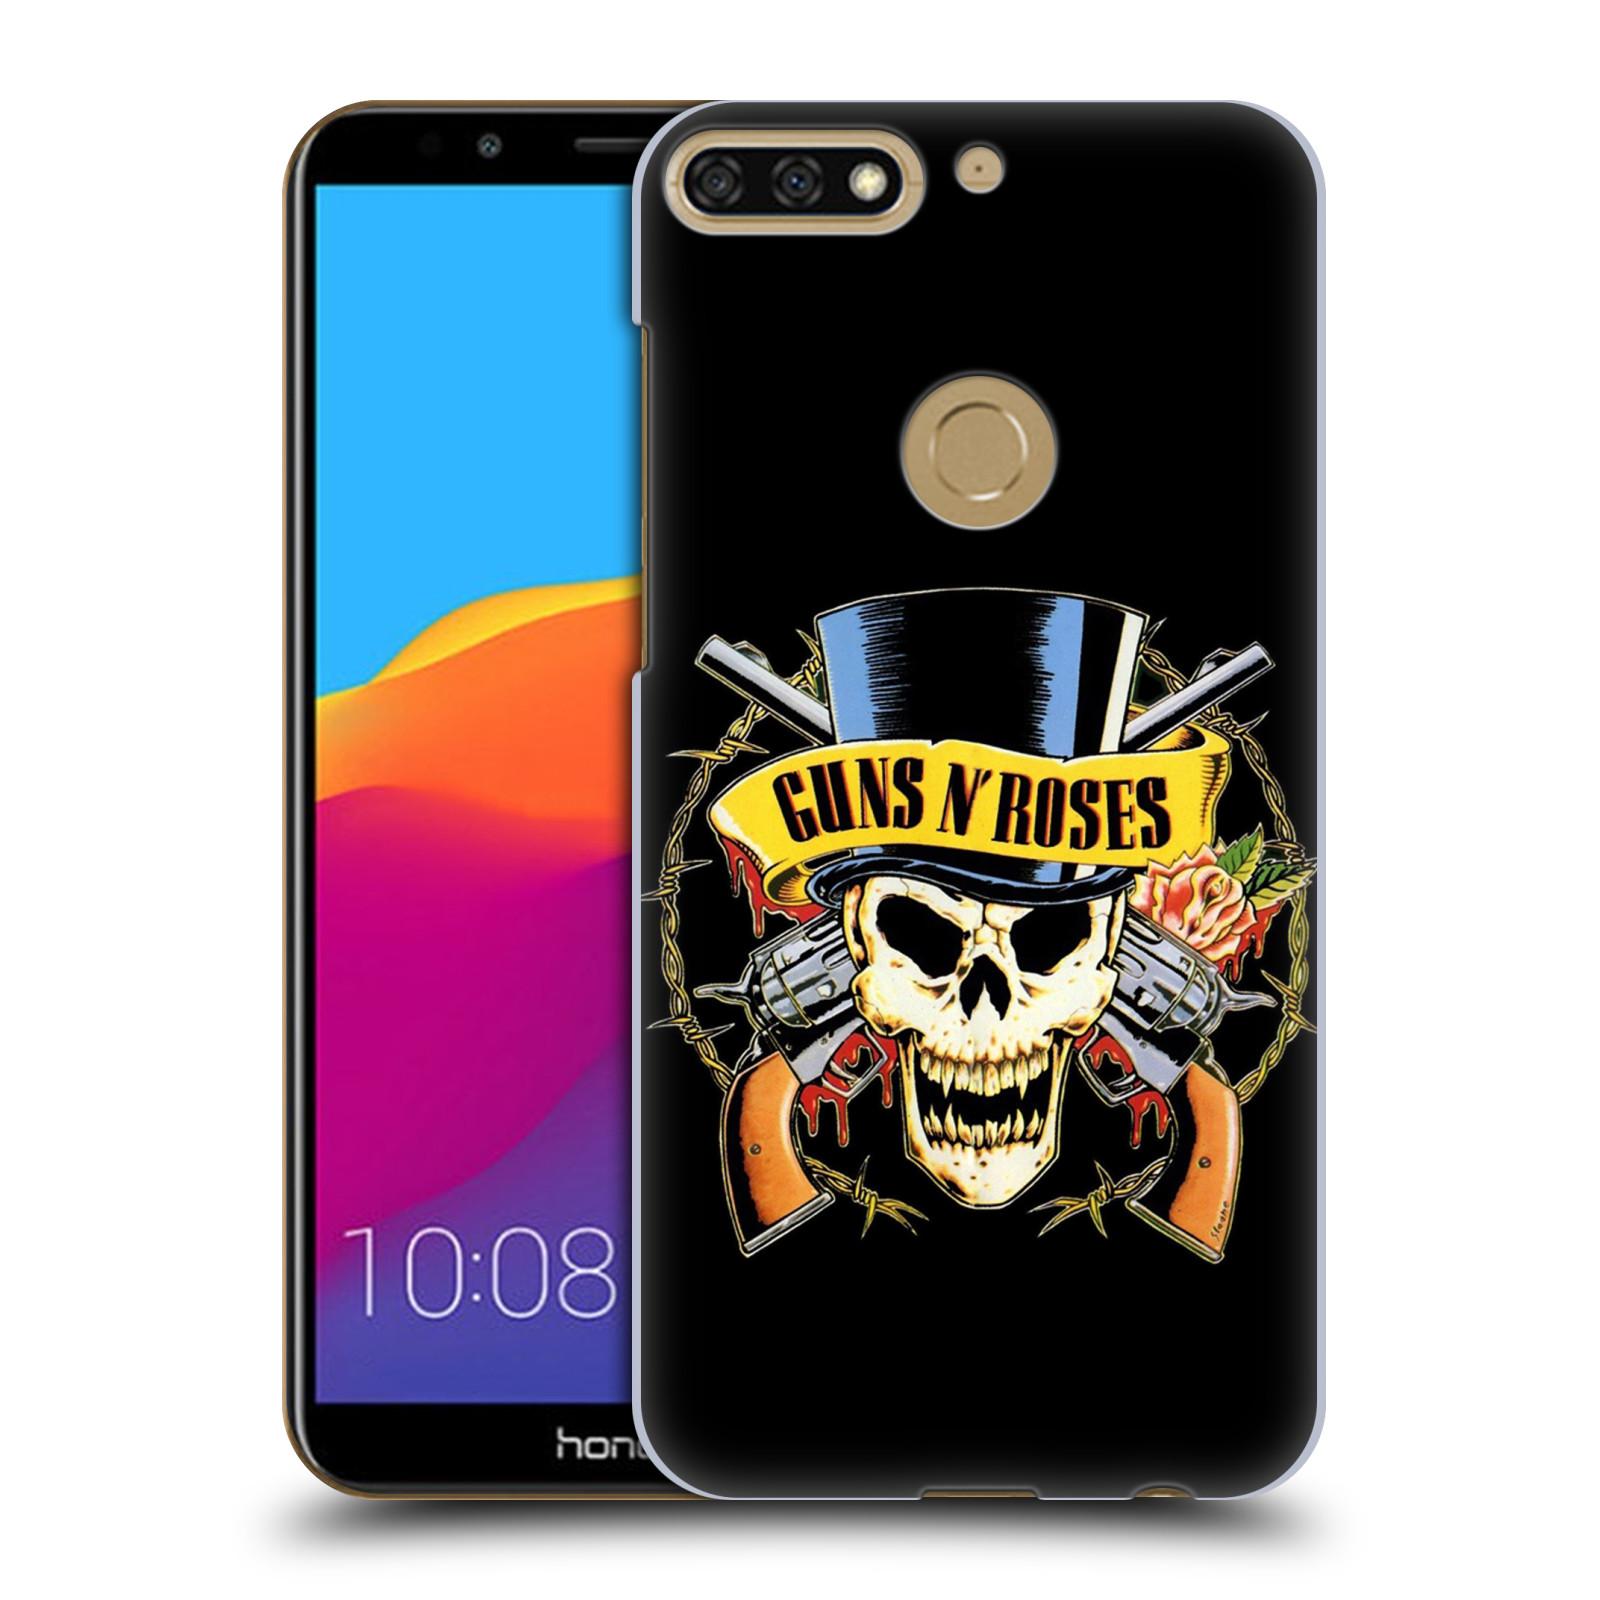 Plastové pouzdro na mobil Huawei Y7 Prime 2018 - Head Case - Guns N' Roses - Lebka